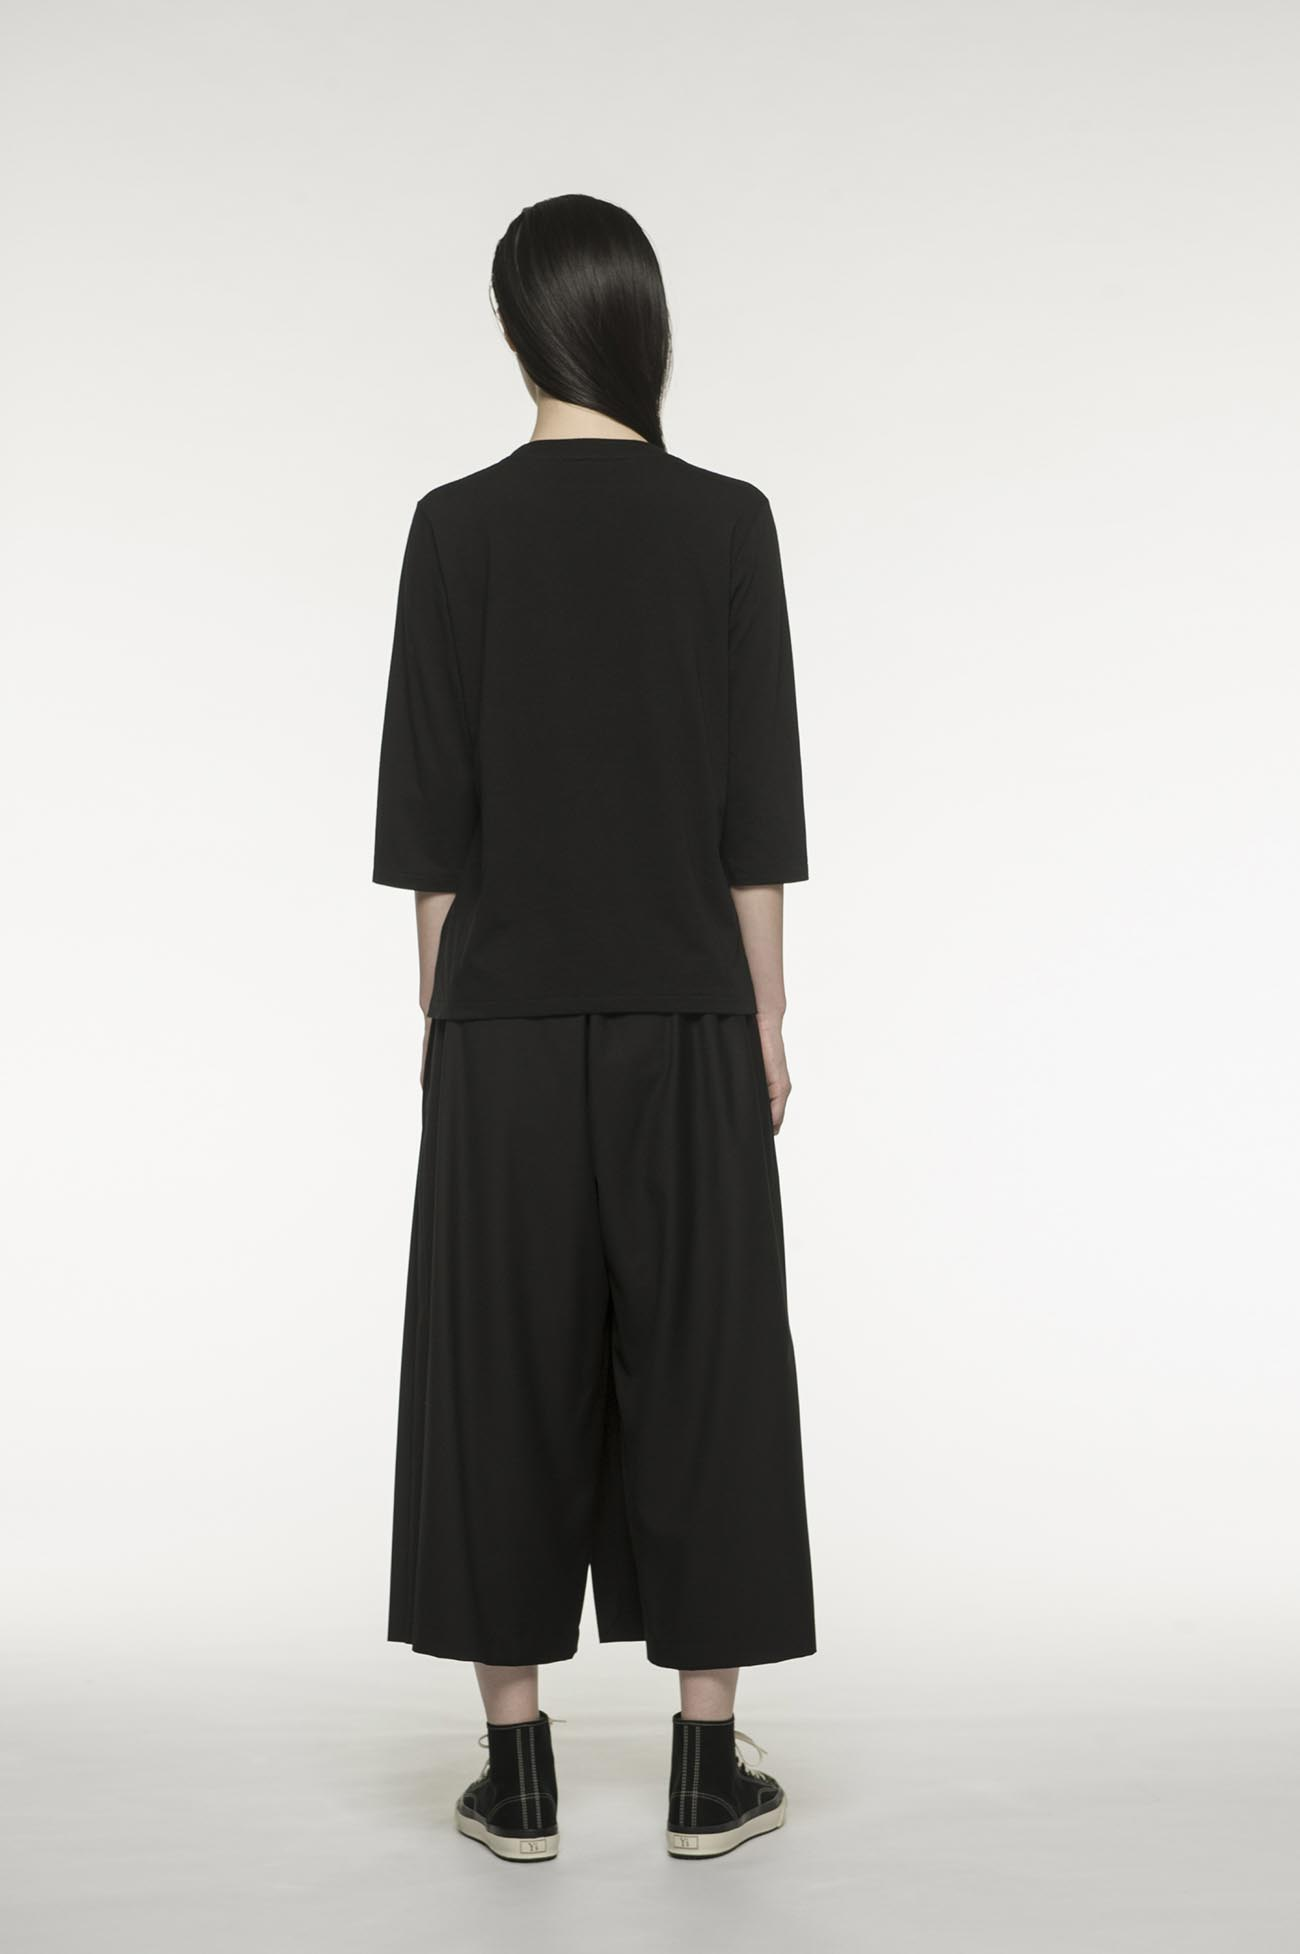 RISMATby Y's棉质面料3/4袖T恤,搭配商场针织